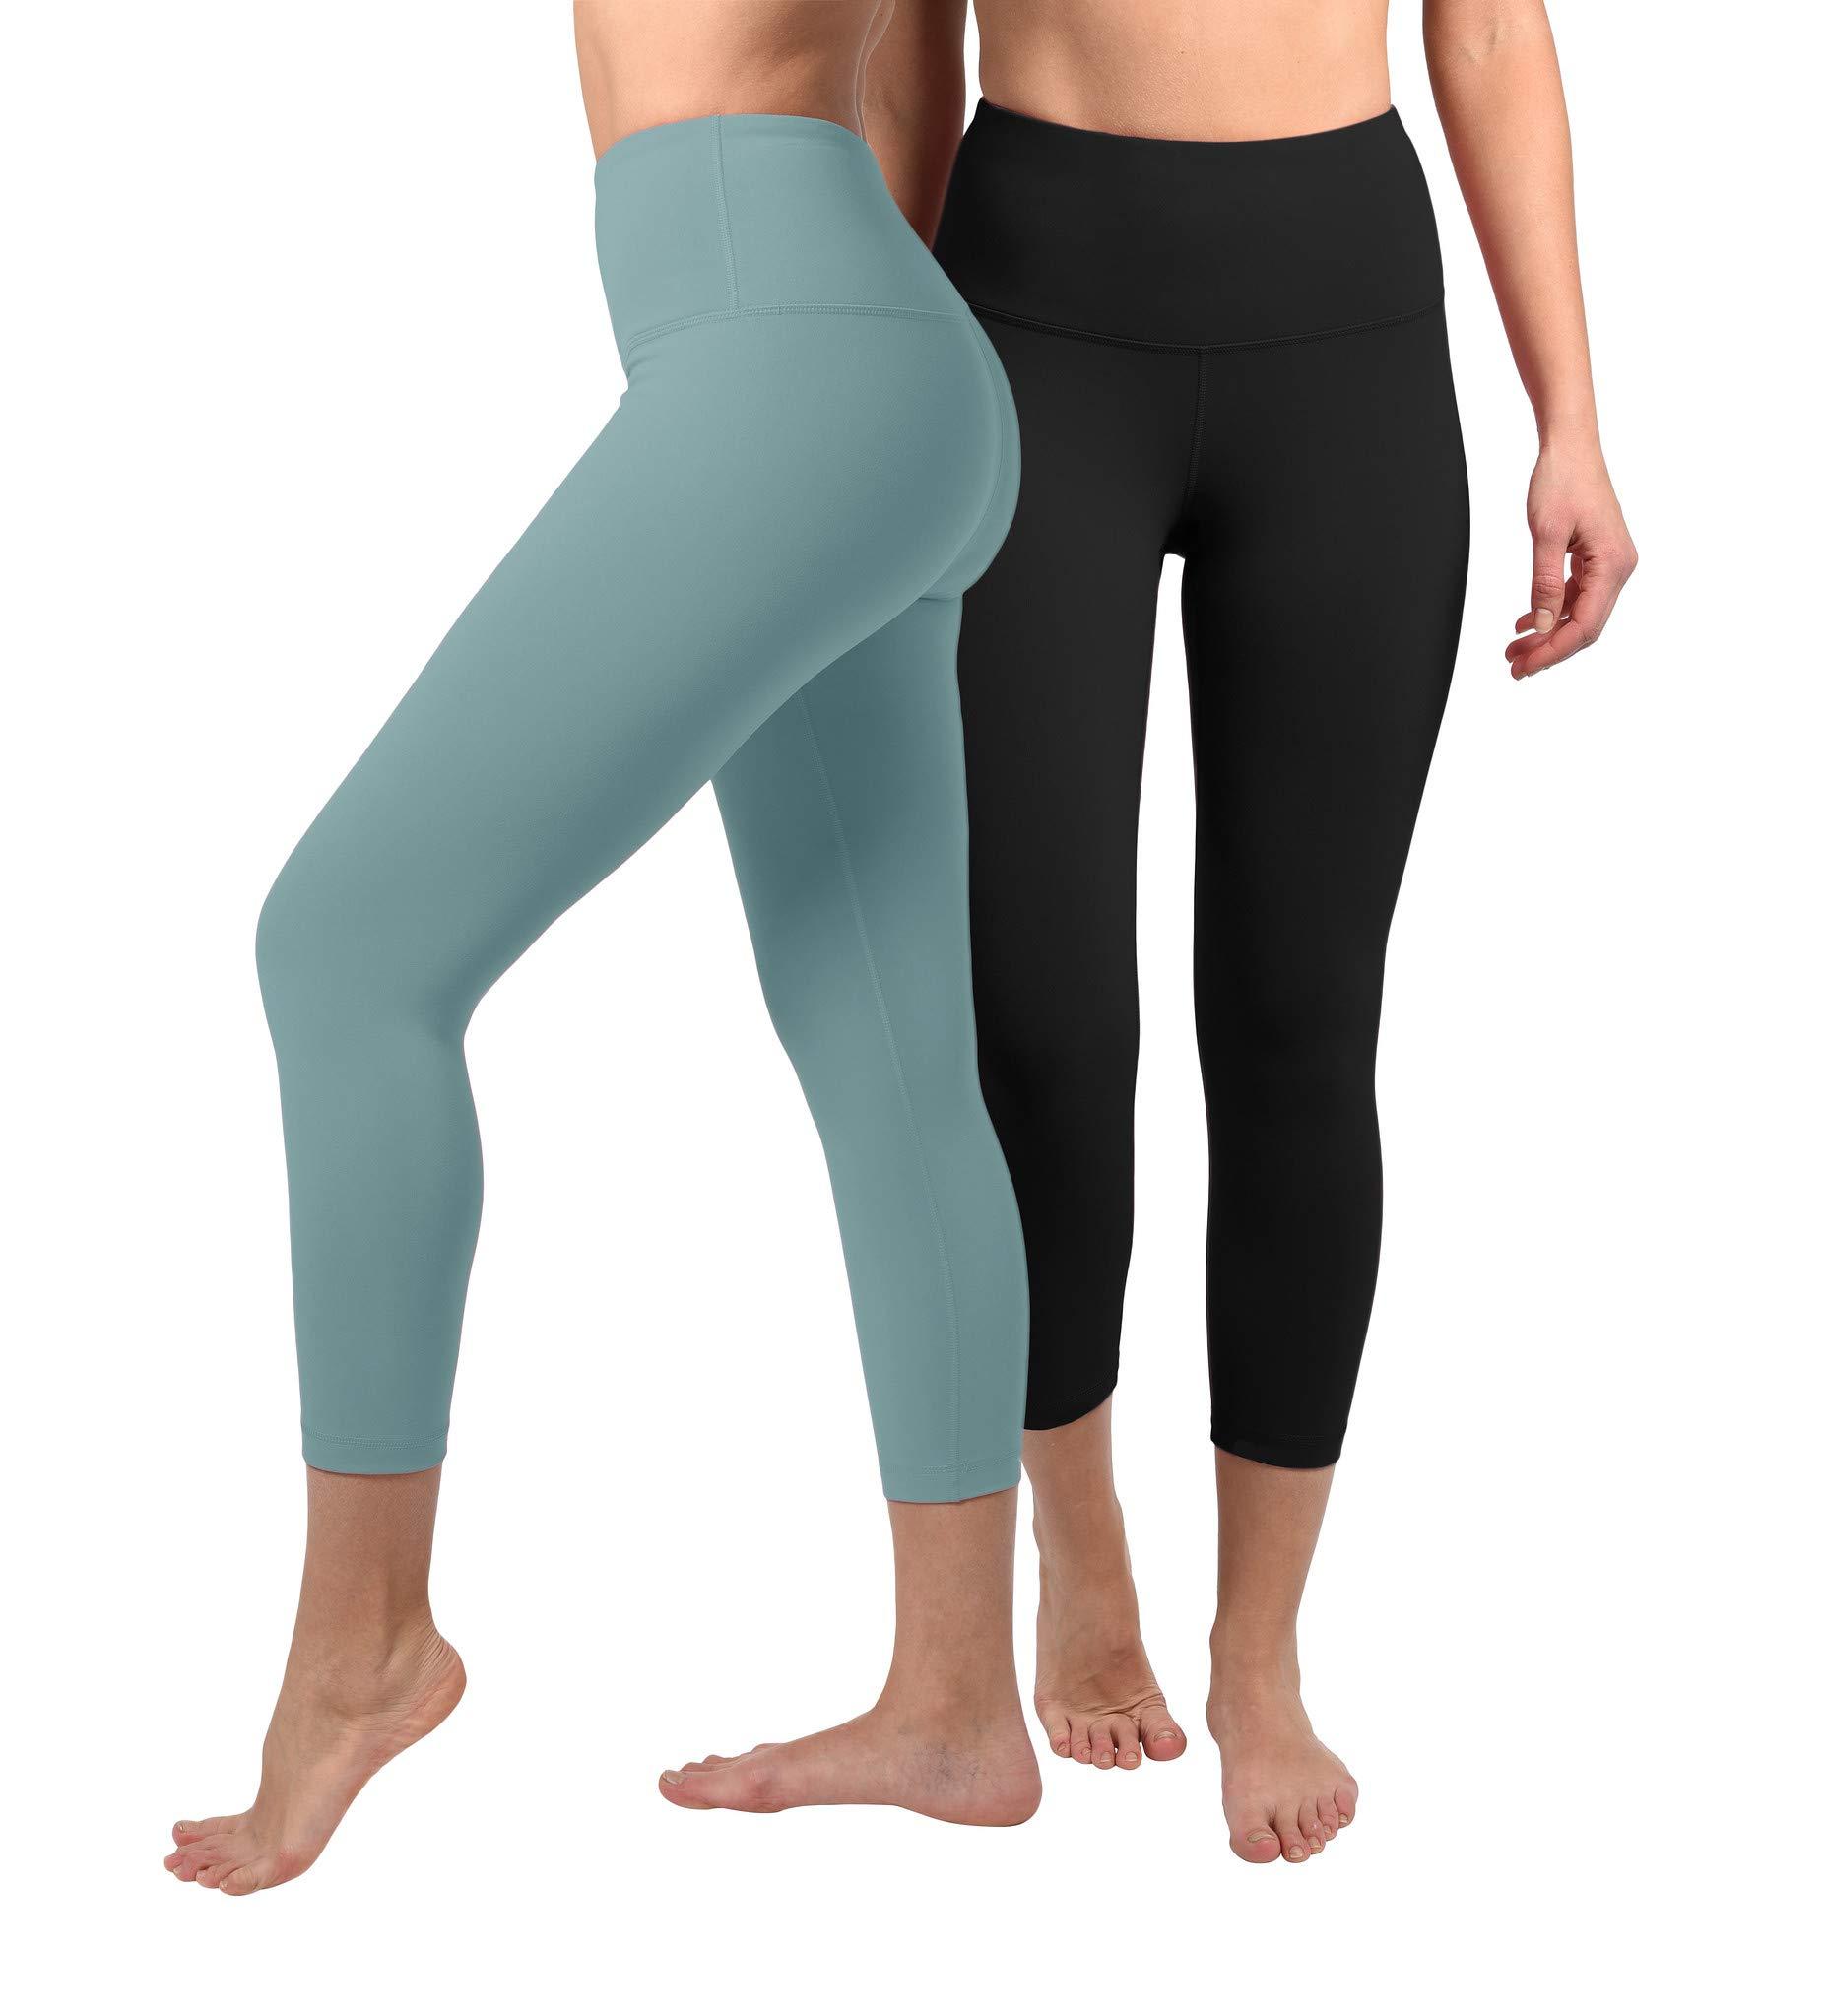 90 Degree By Reflex - High Waist Tummy Control Shapewear - Power Flex Capri - Black and Azure Splash 2 Pack - XS